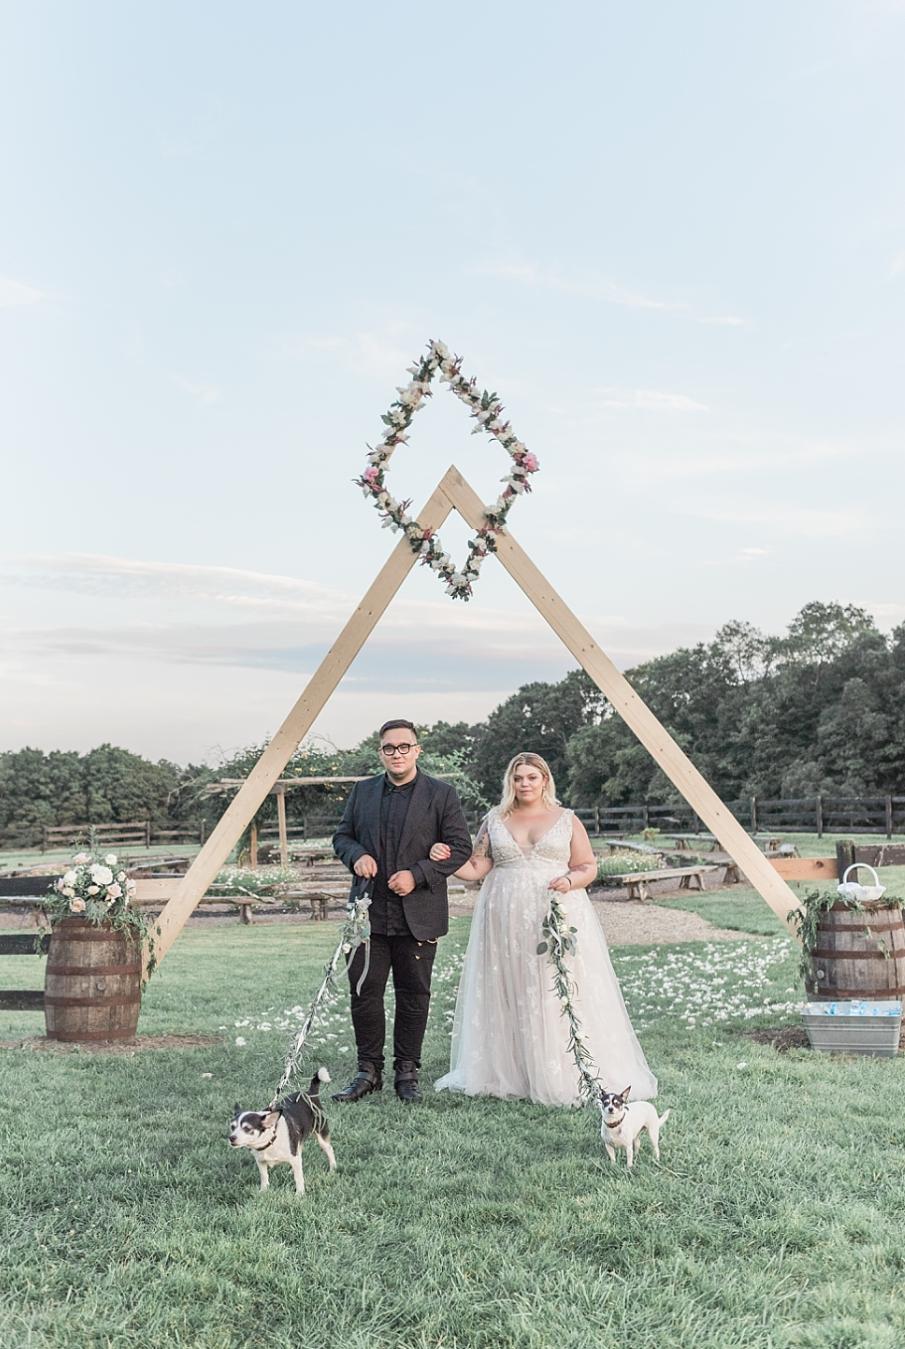 The Hayloft_Mili Wedding54.png